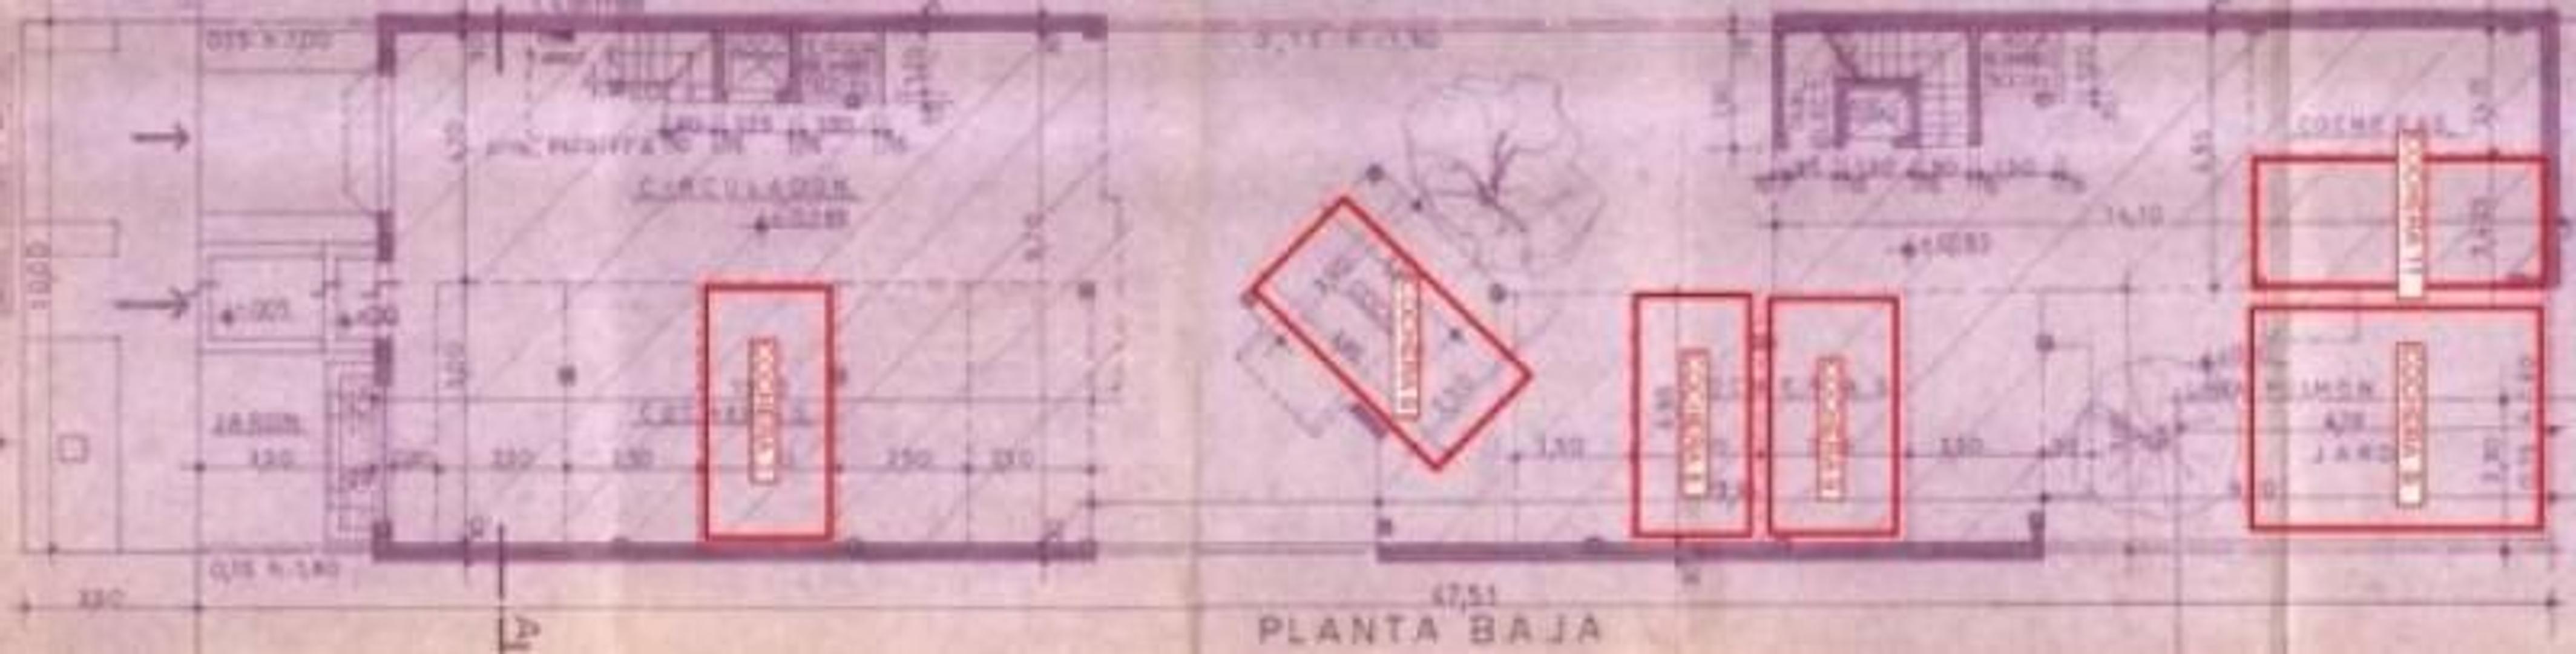 Cochera En Venta En Diego Palma 400 San Isidro